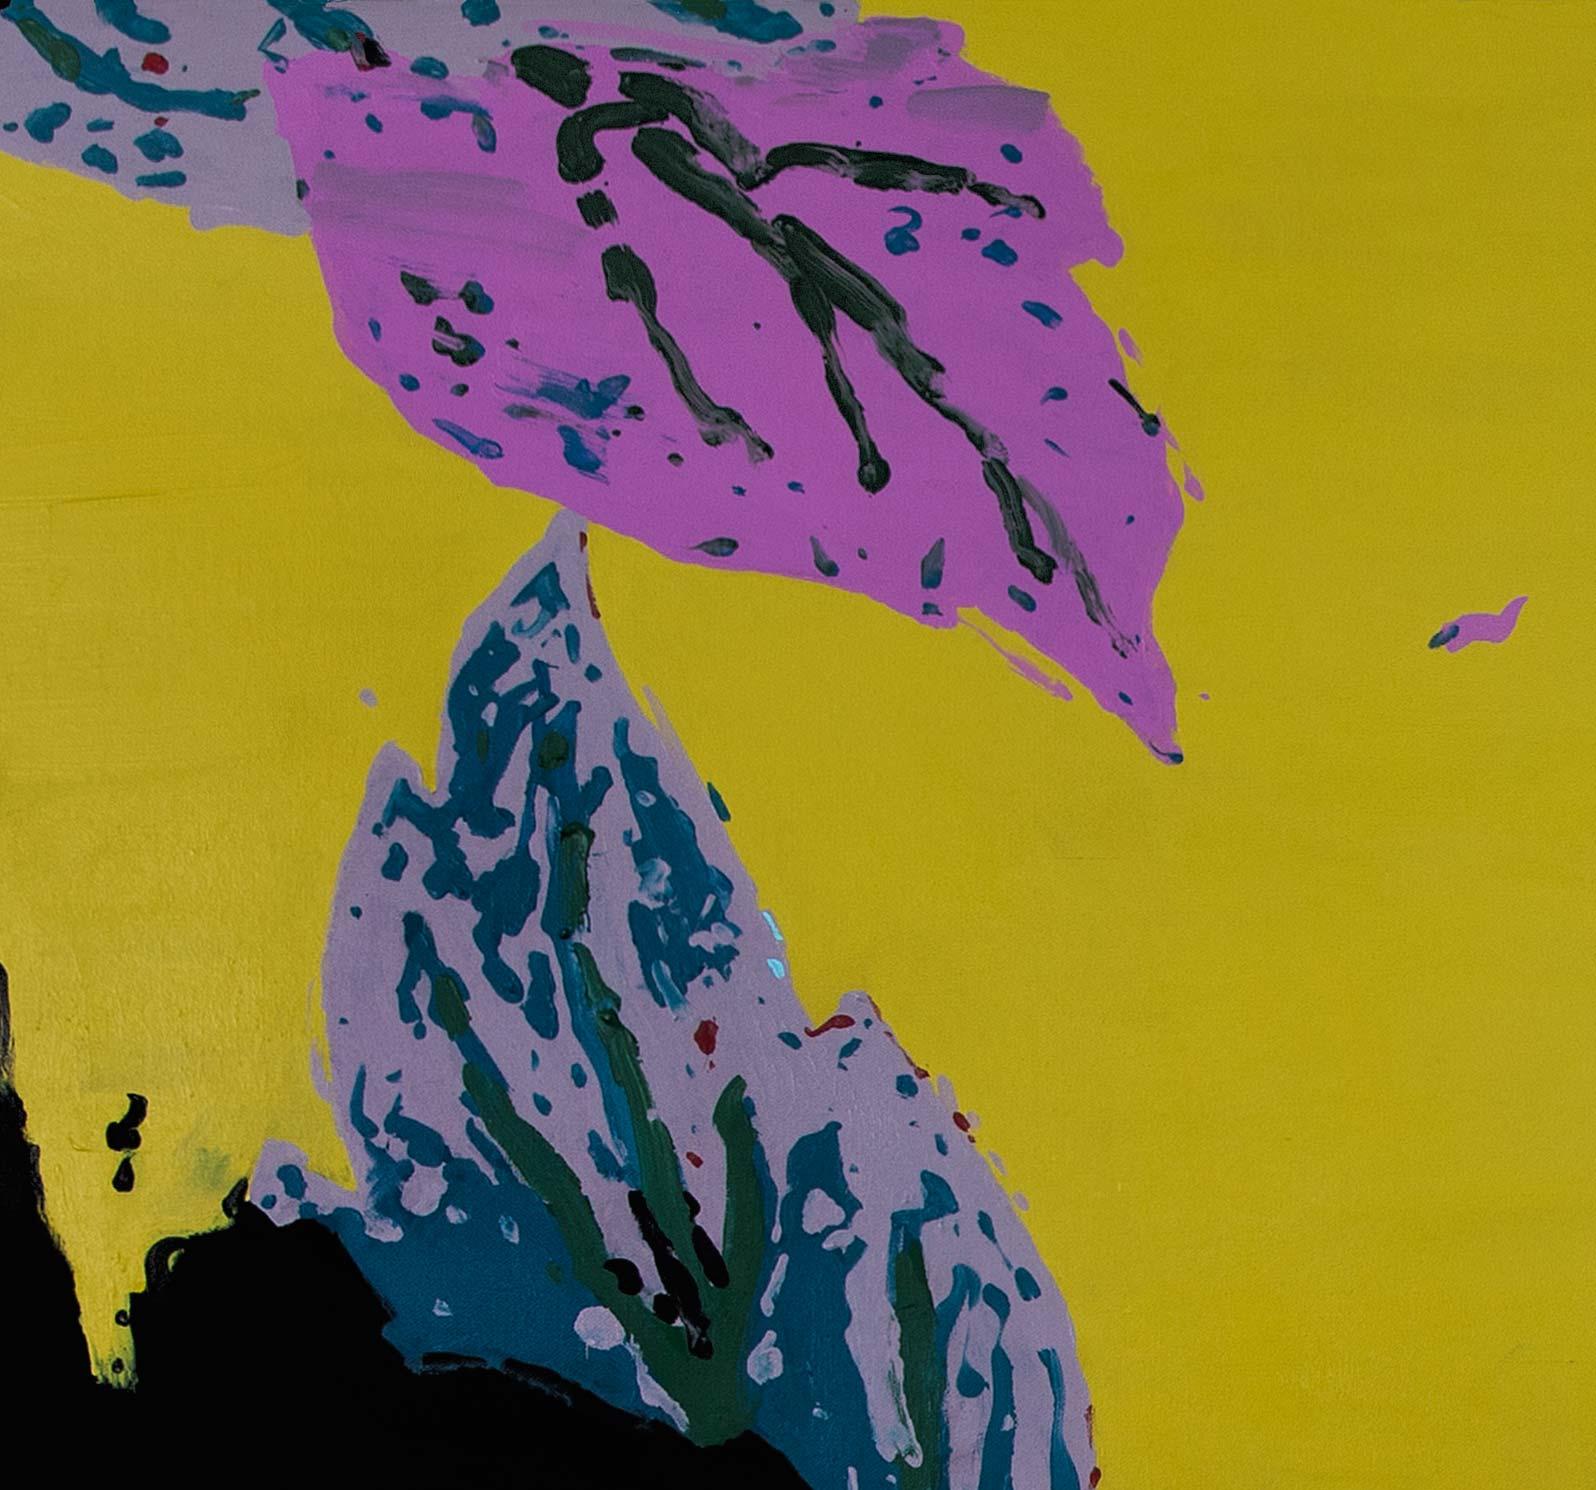 Anca Stefanescu | Modern Acrylic Painting Artists, Echo